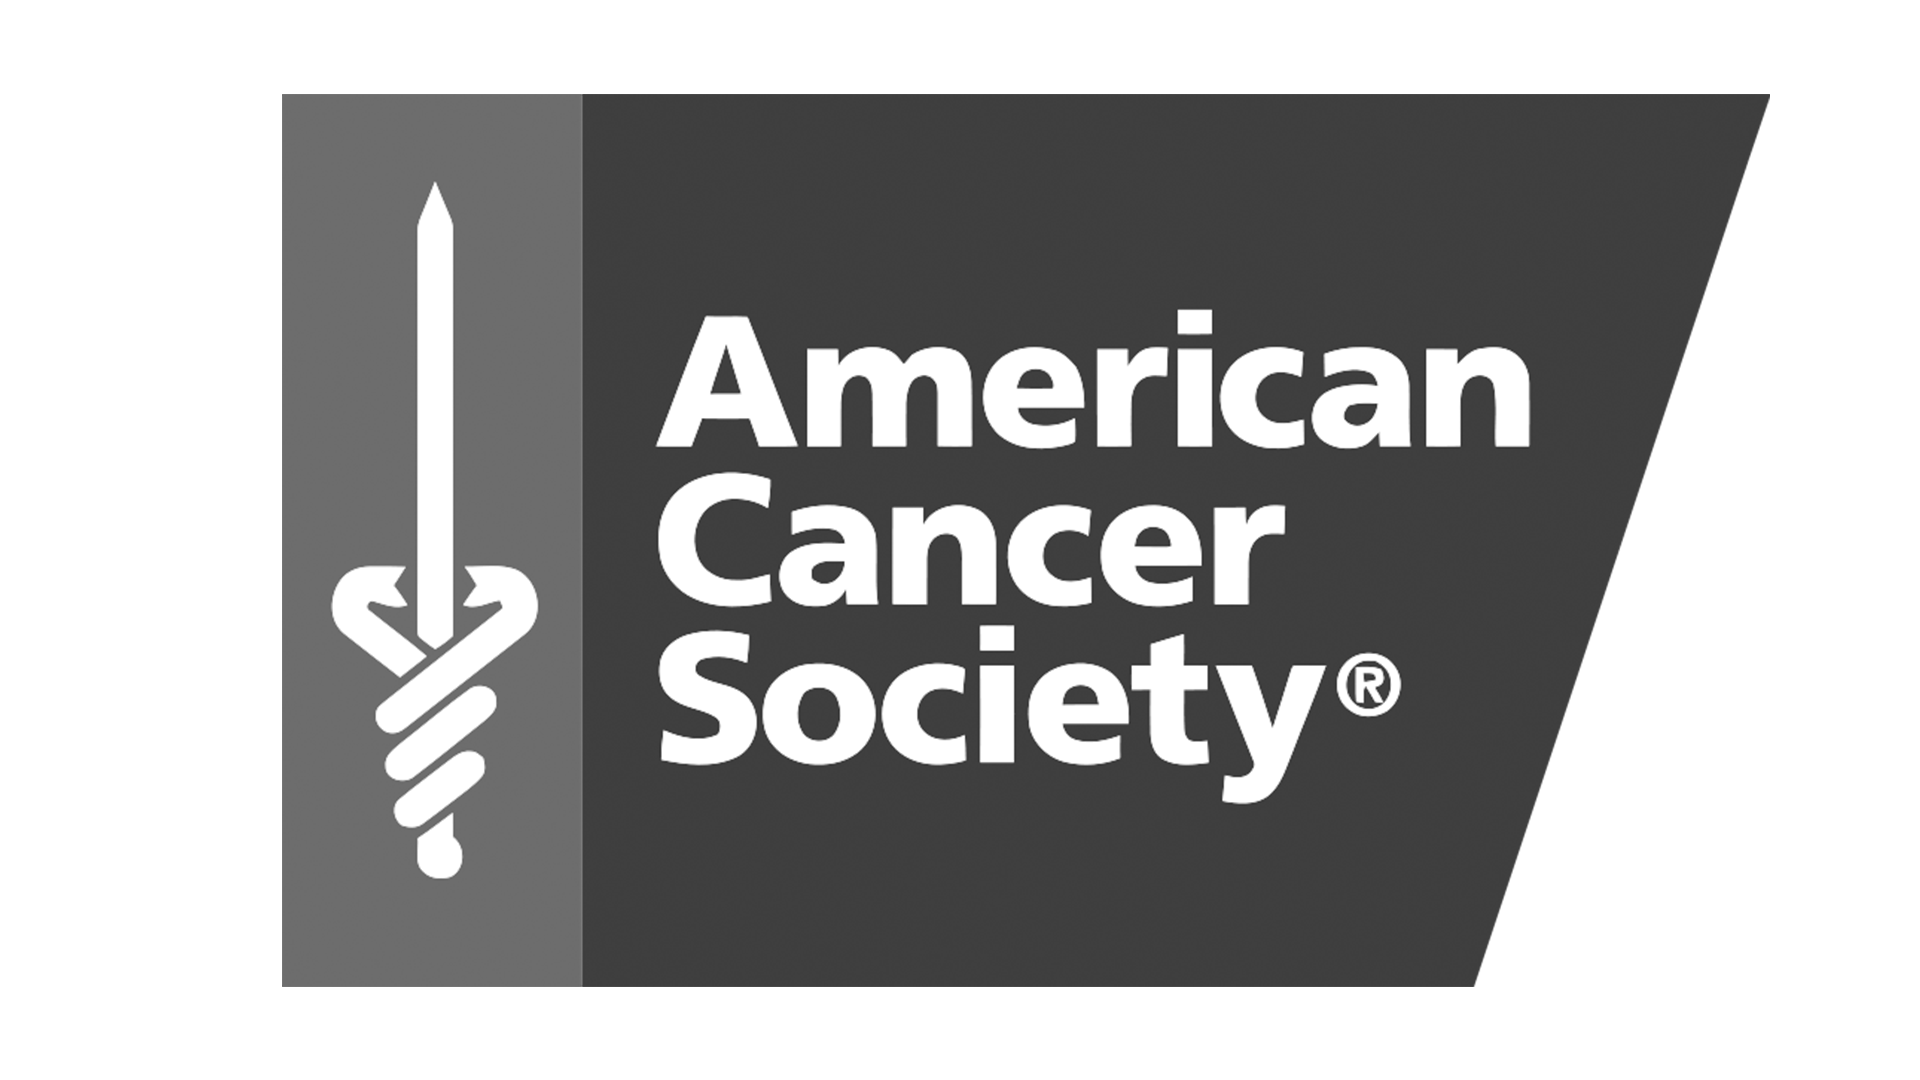 American Cancer Society - CKP logo.png